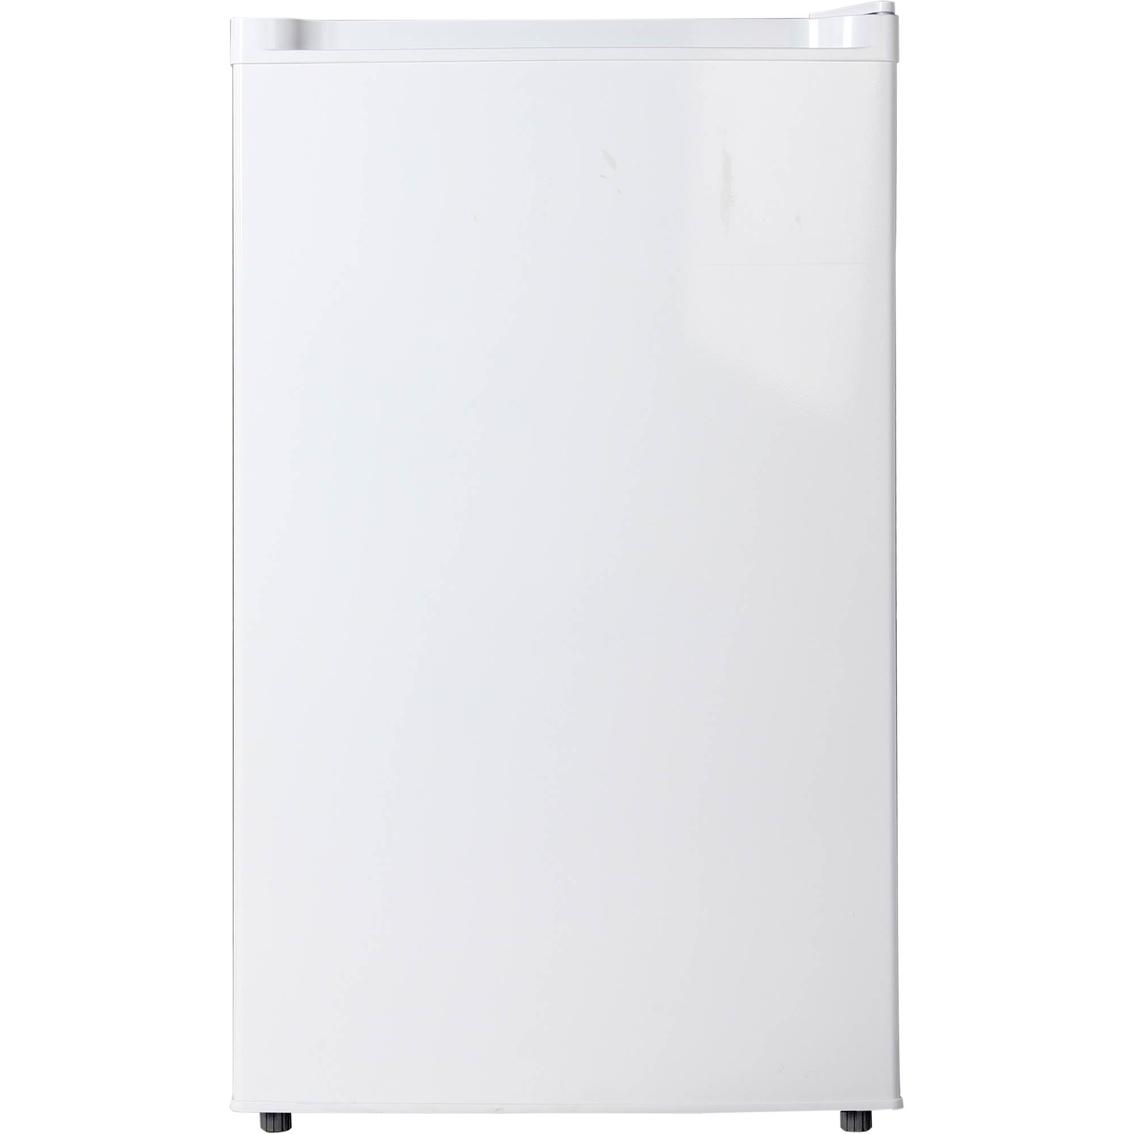 Midea 3.0 Cu. Ft. Upright Freezer, White | Freezers | Home